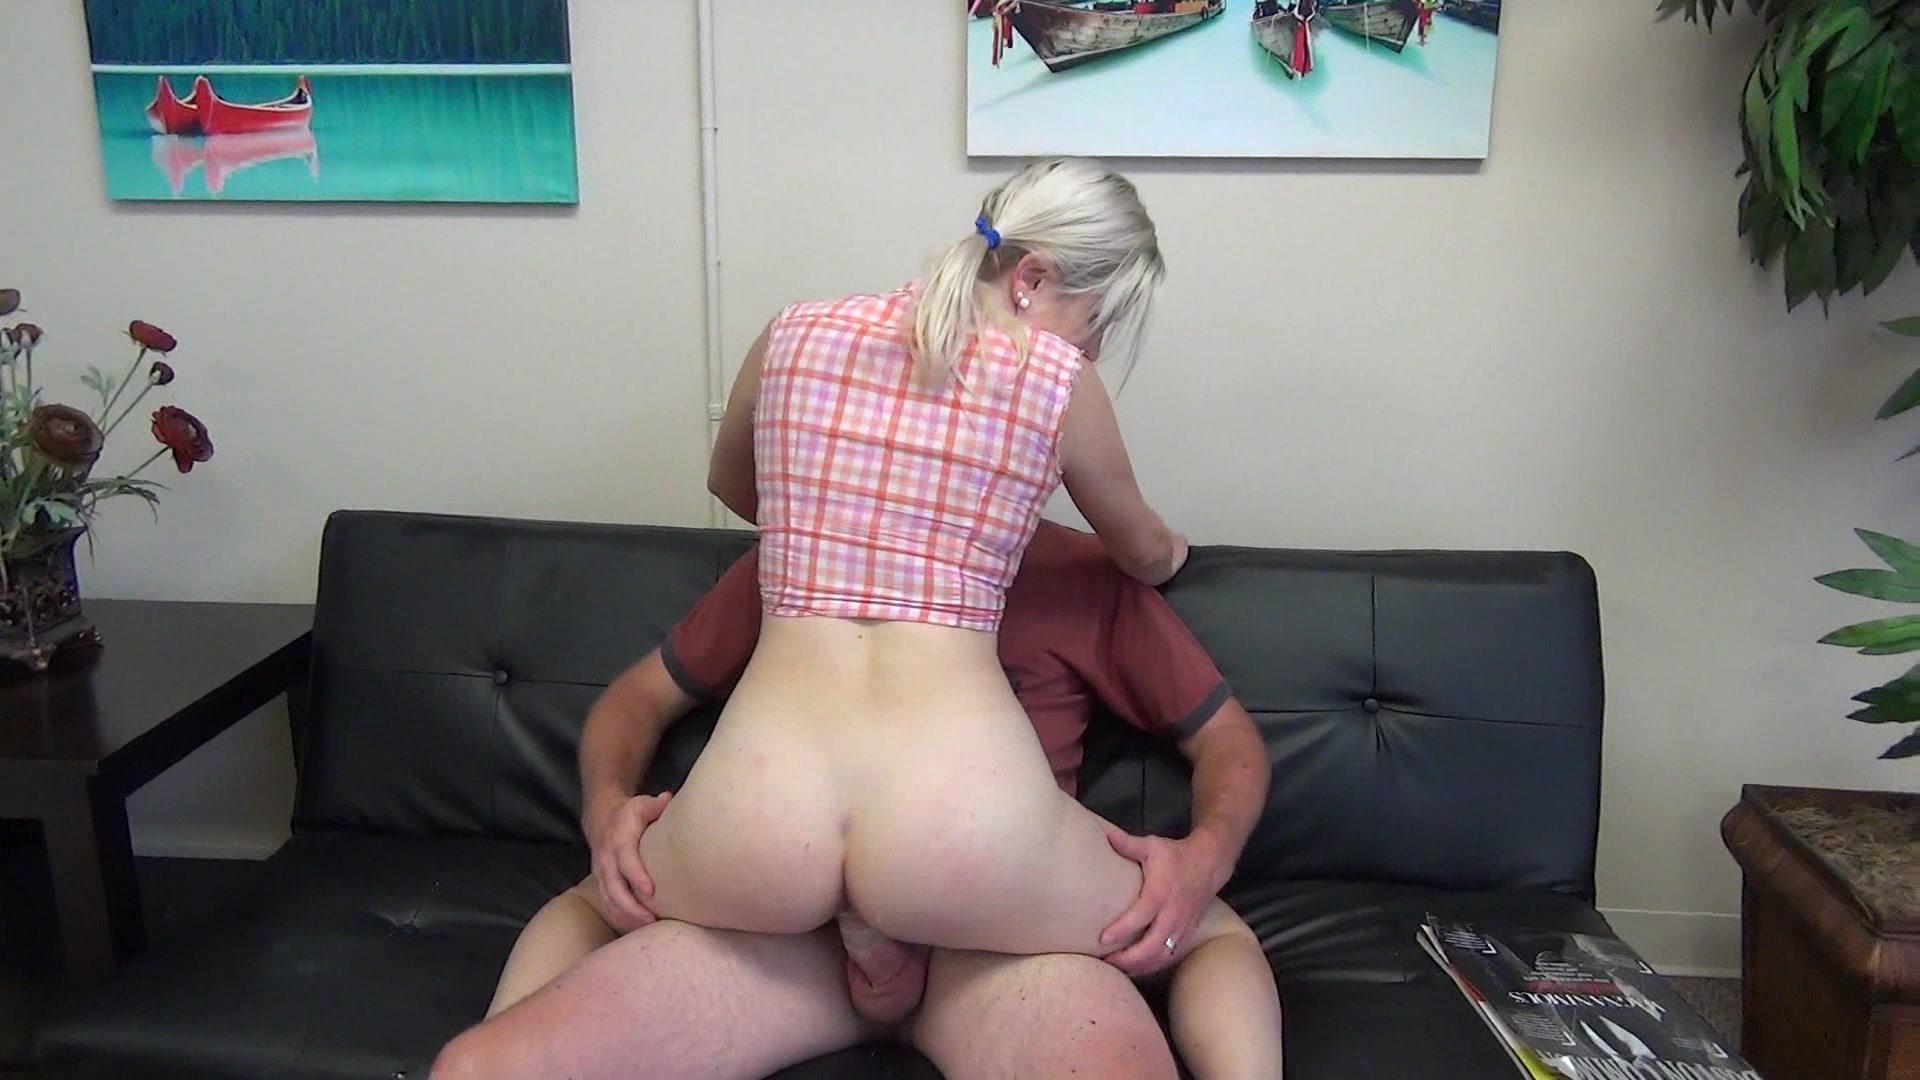 Busty Blond Pornstar Daisy Aka